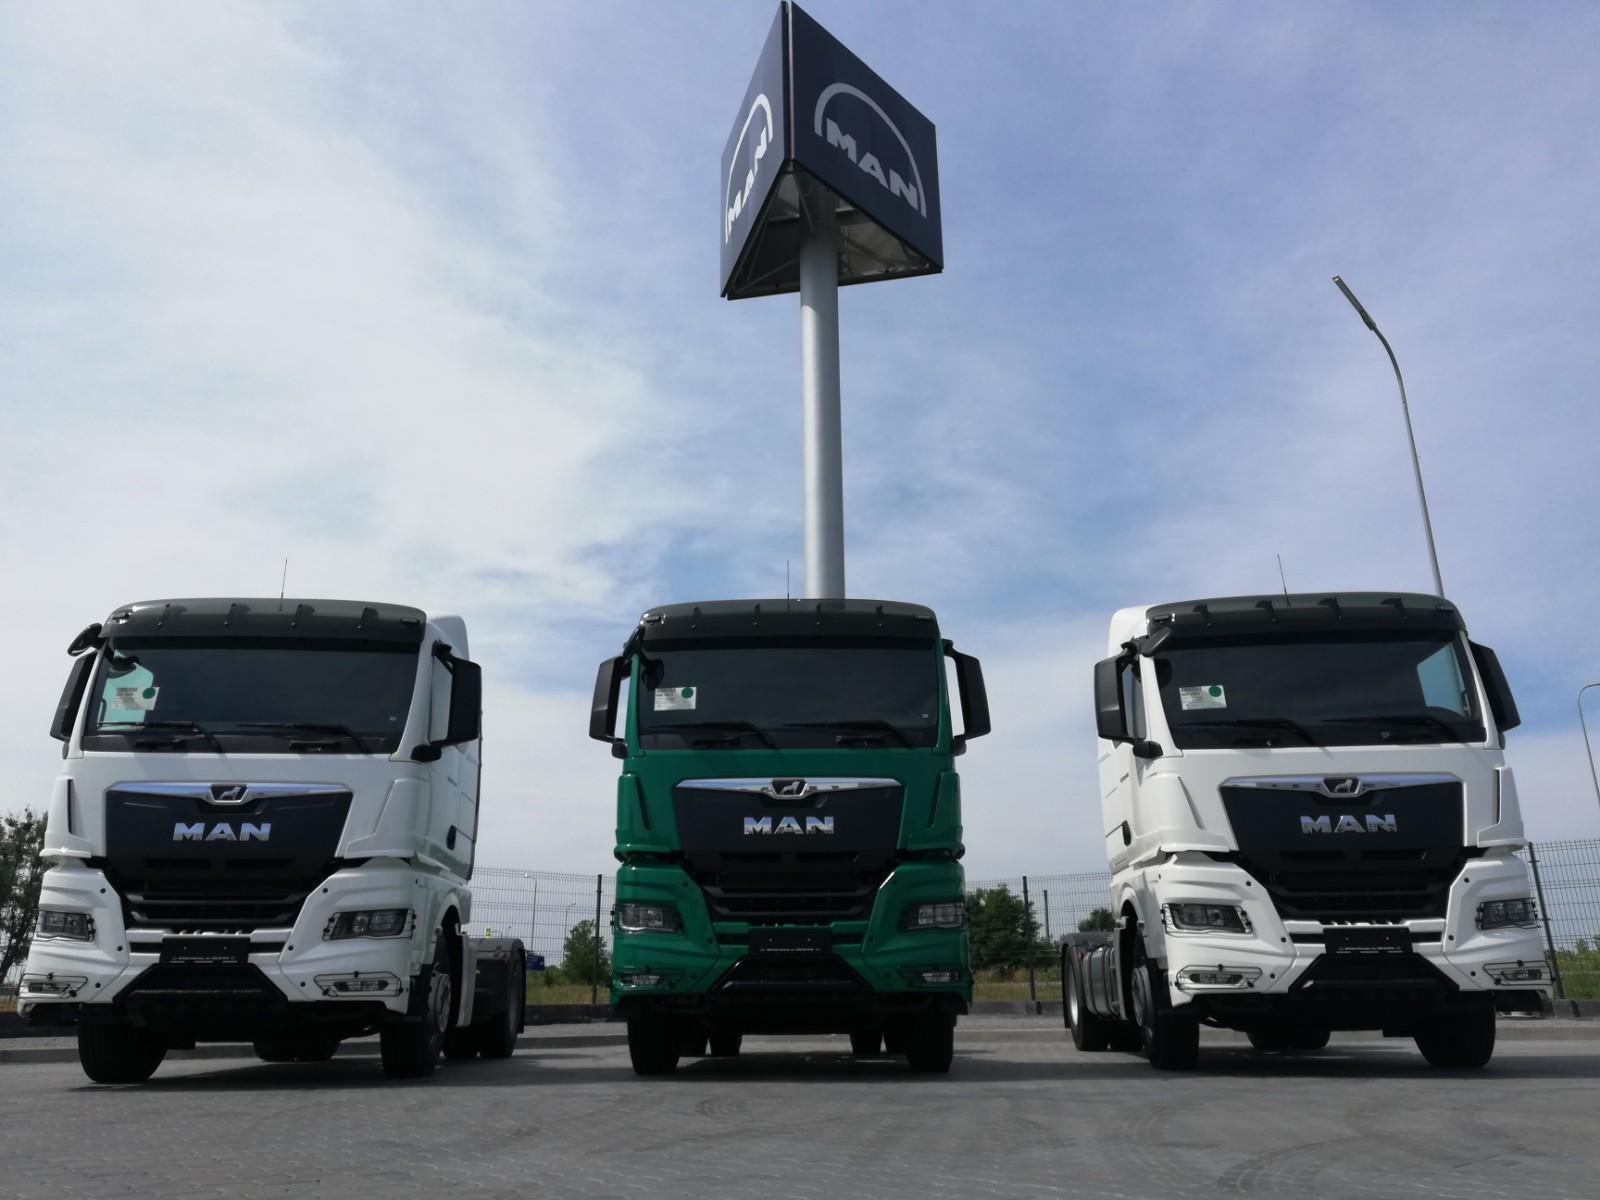 Поставка новой техники MAN — трех тягачей MAN TGX 18.440 4×2 нового поколения TG3